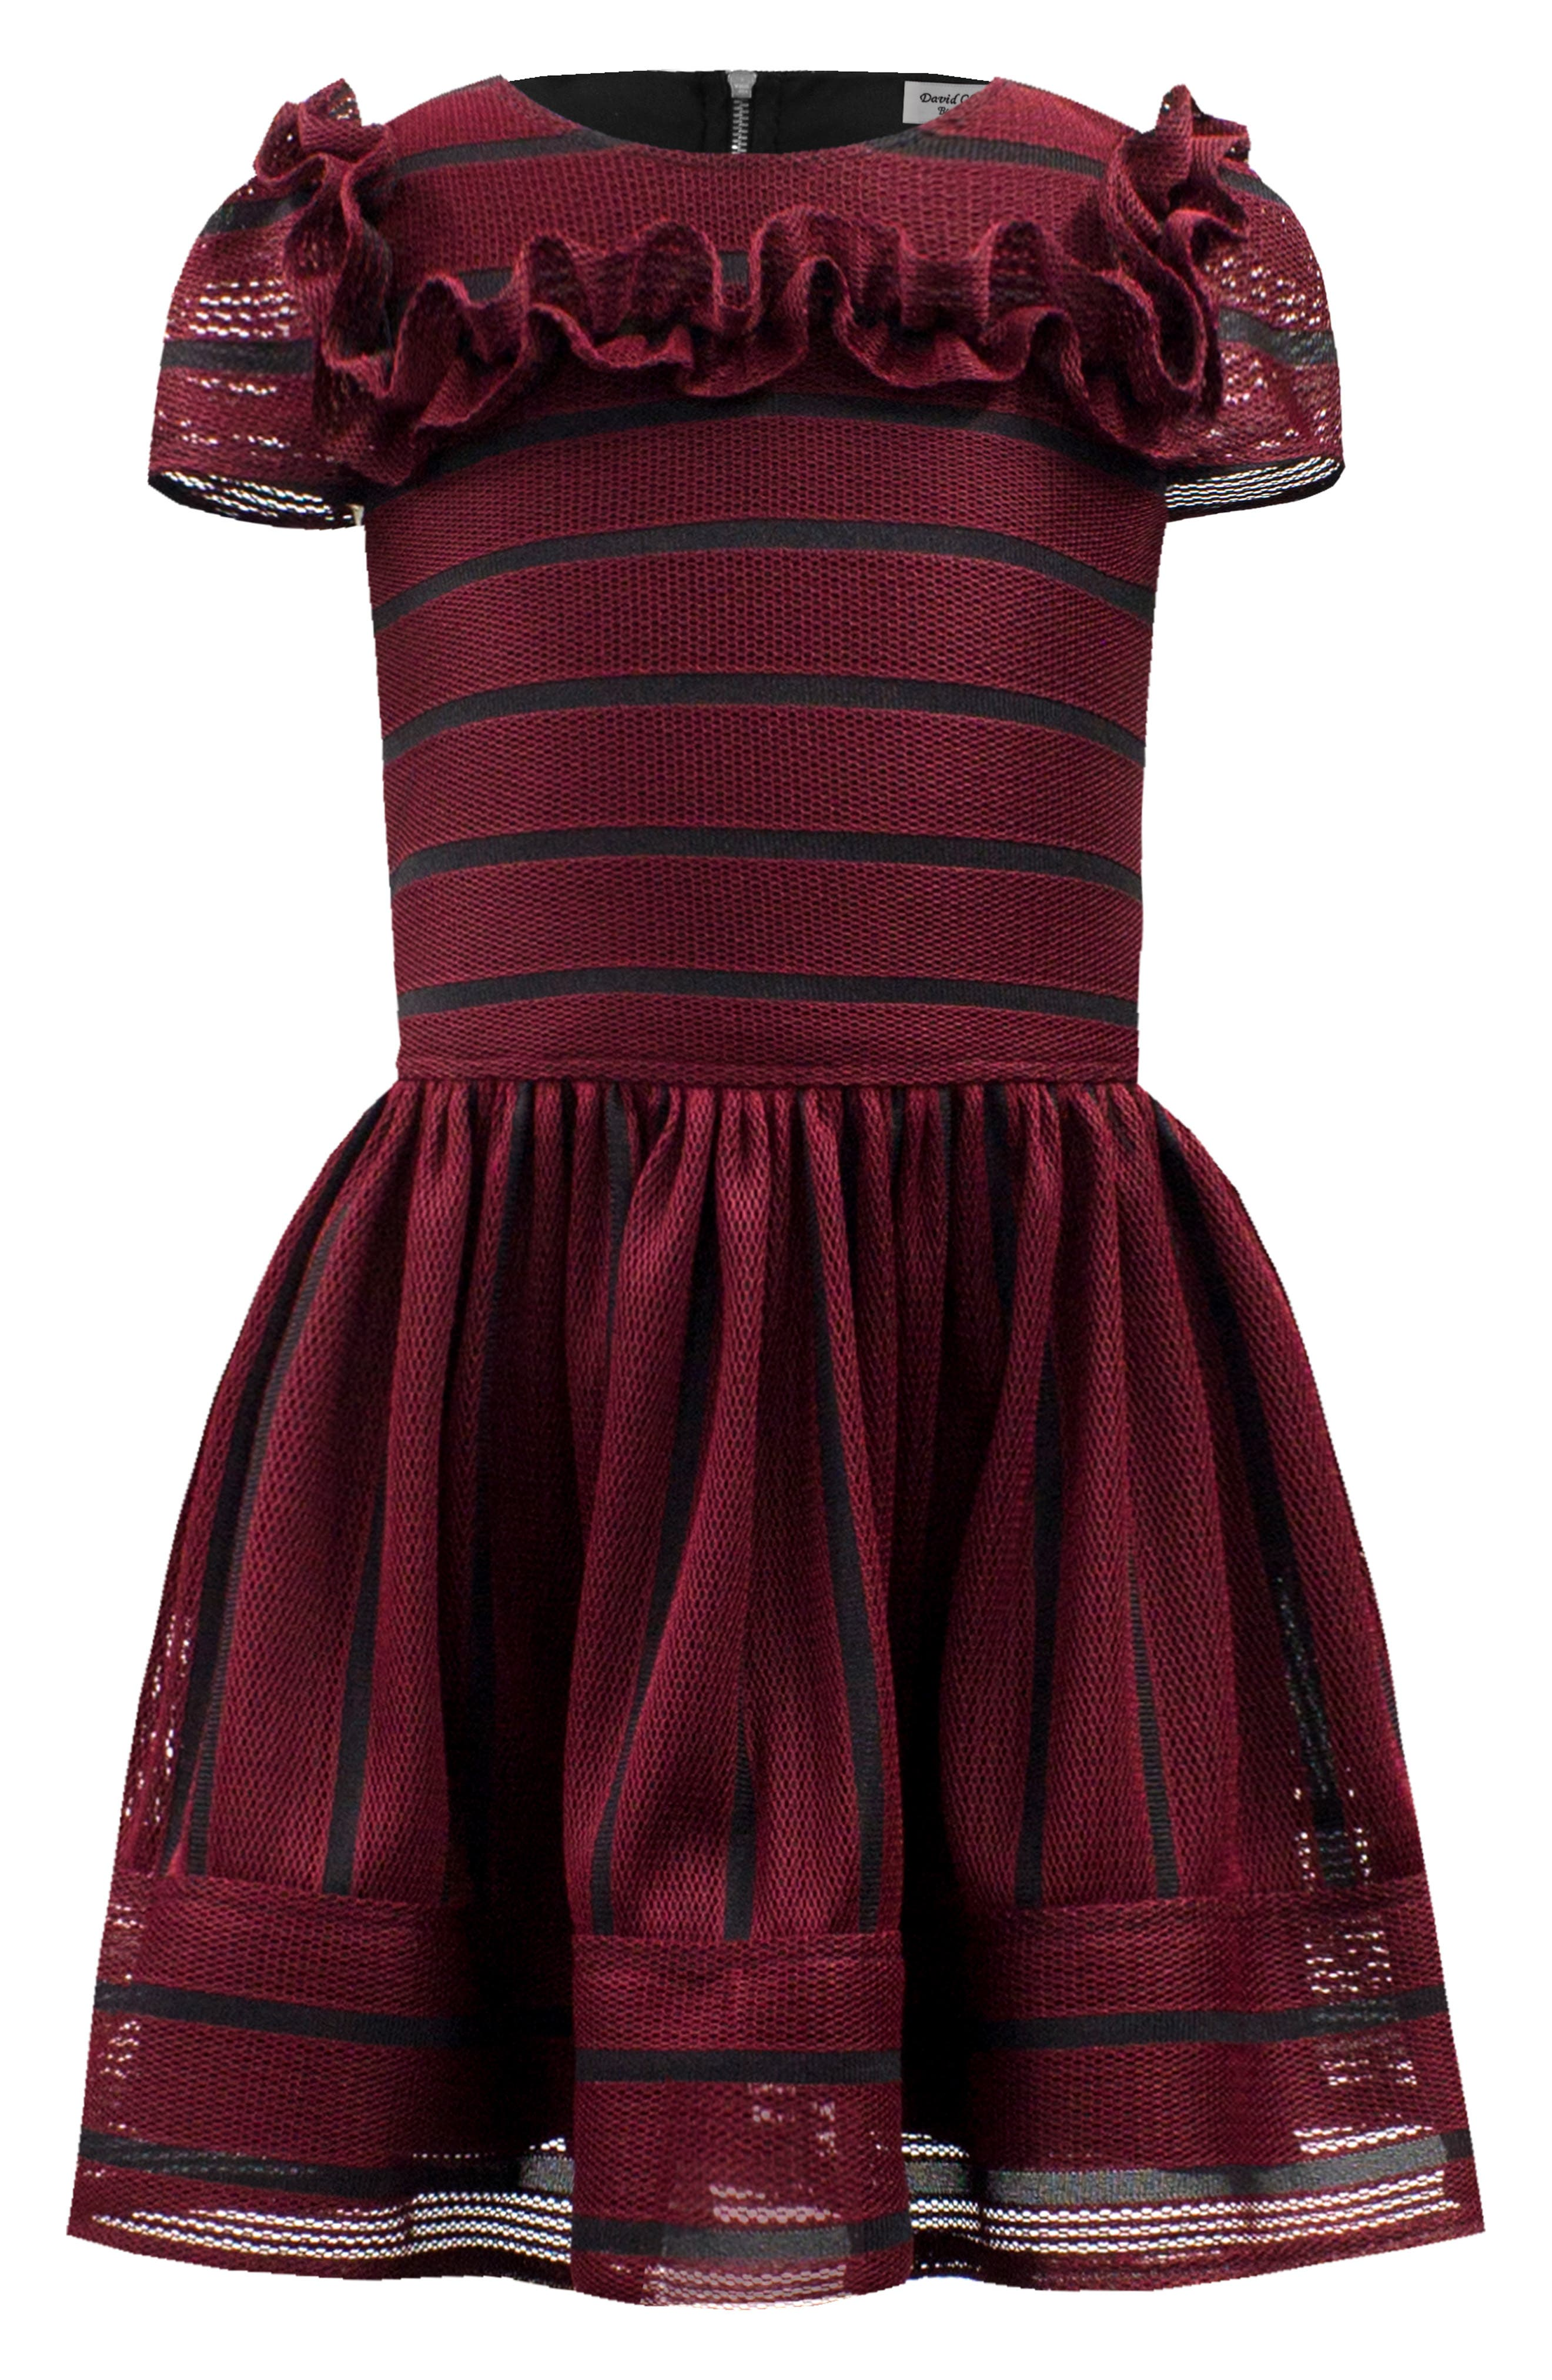 DAVID CHARLES,                             Stripe Techno Frill Fit & Flare Dress,                             Main thumbnail 1, color,                             WINE